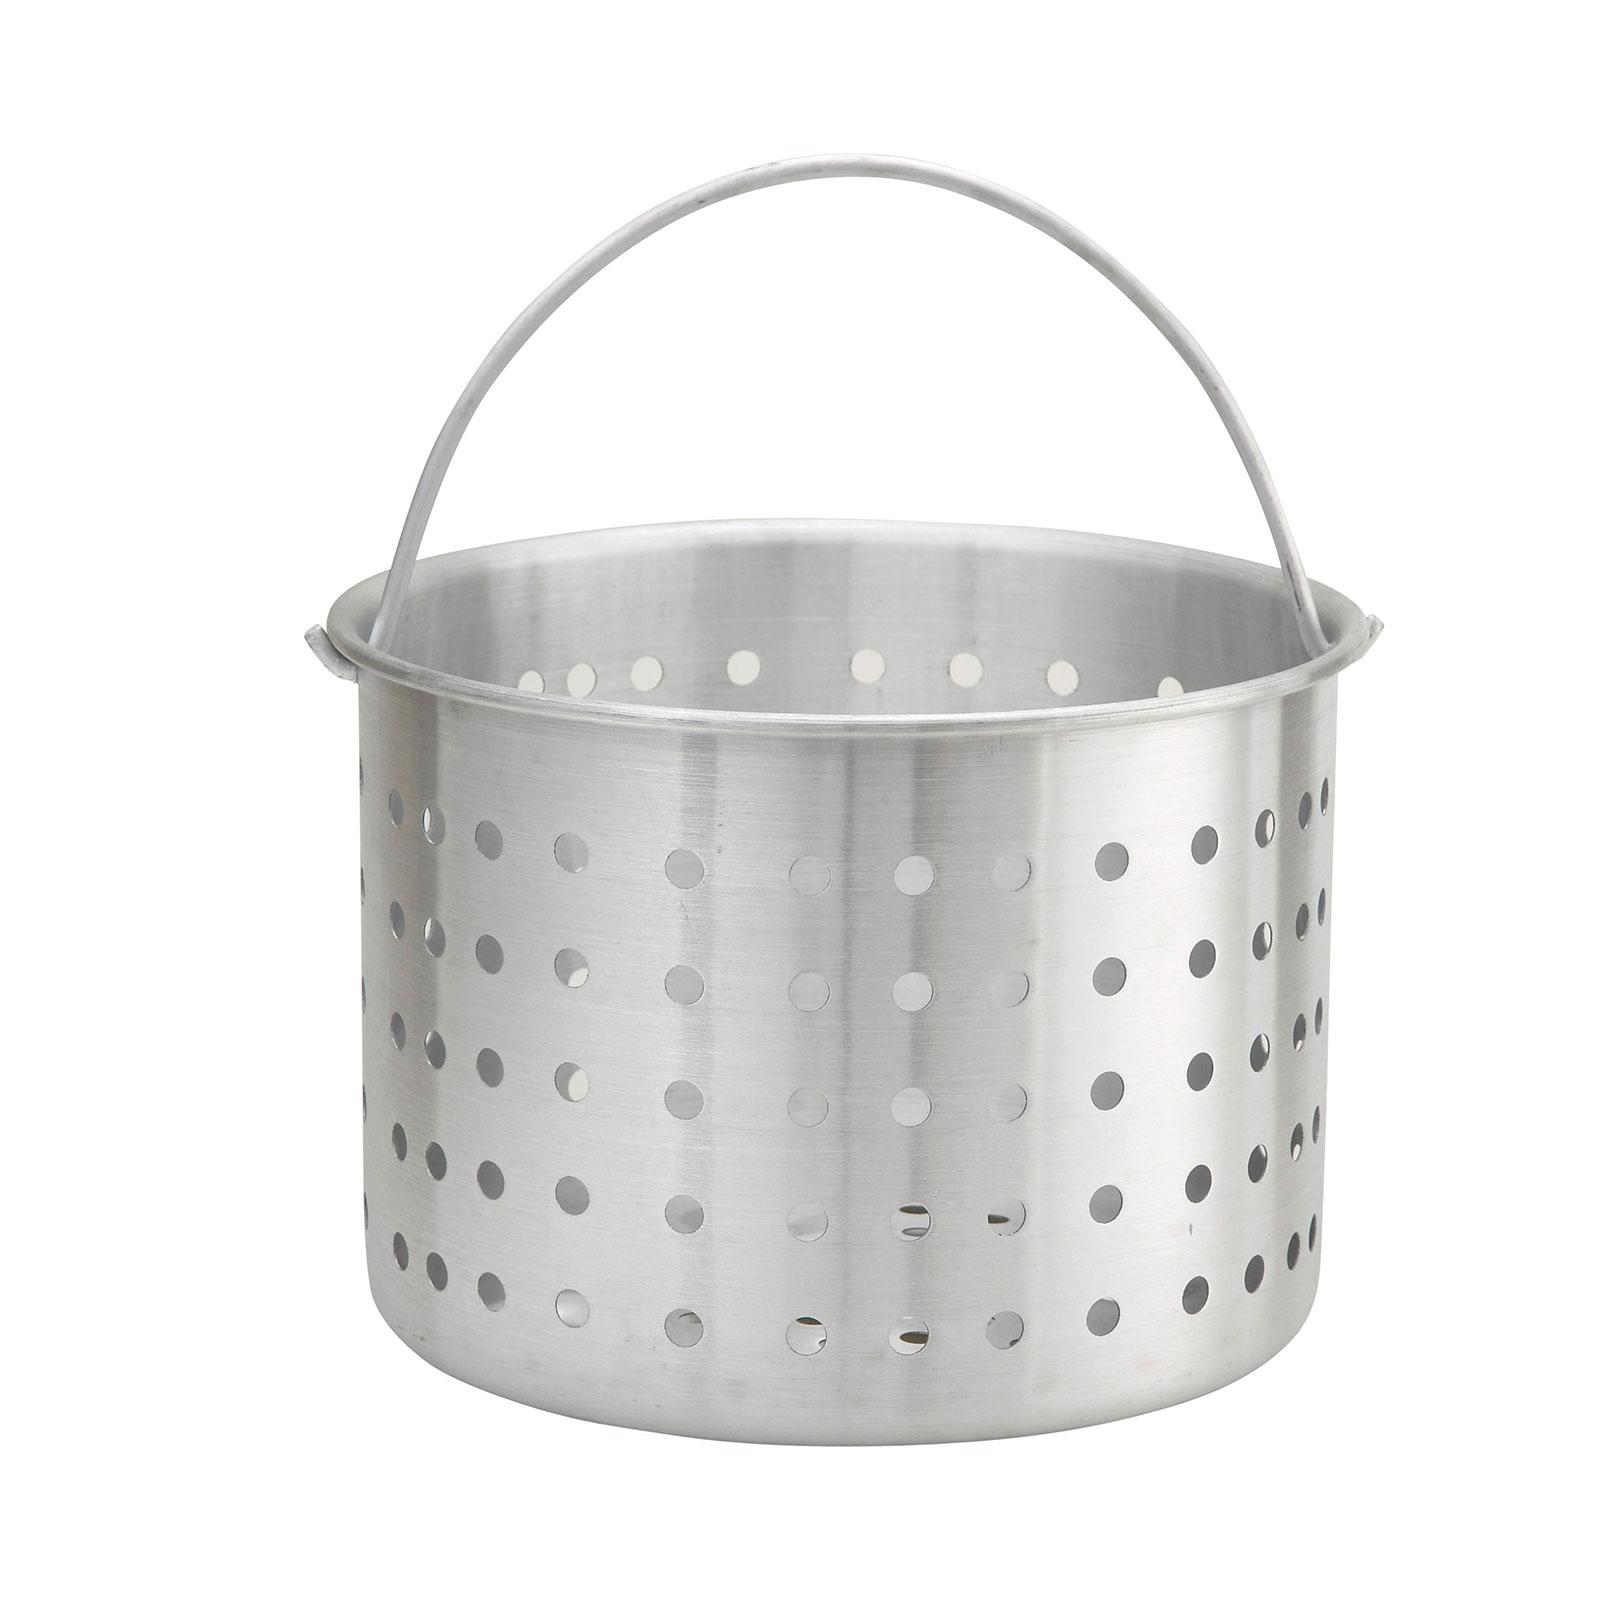 1000-24 Winco ALSB-20 stock / steam pot, steamer basket